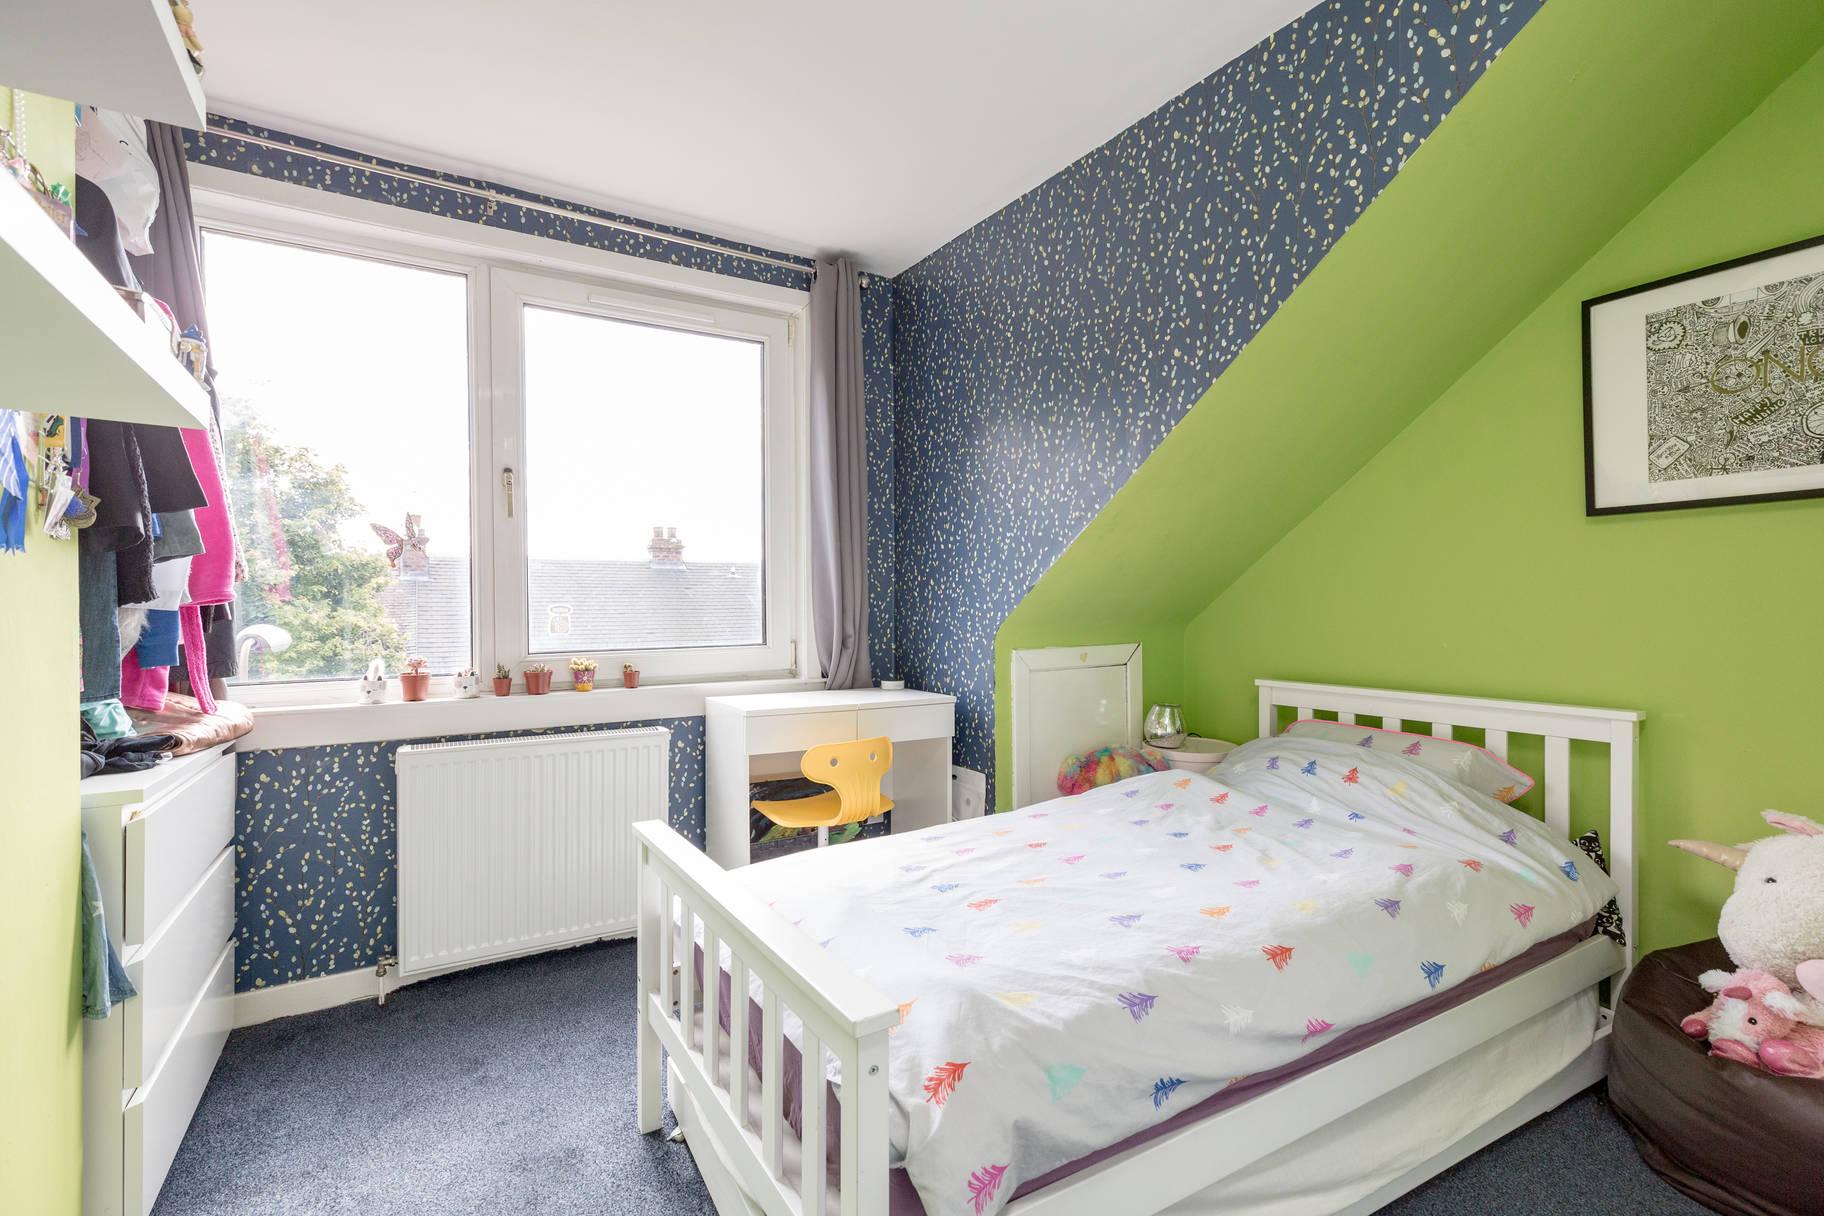 53 Castle Terrace, Winchburgh, West Lothian, EH52 6RH